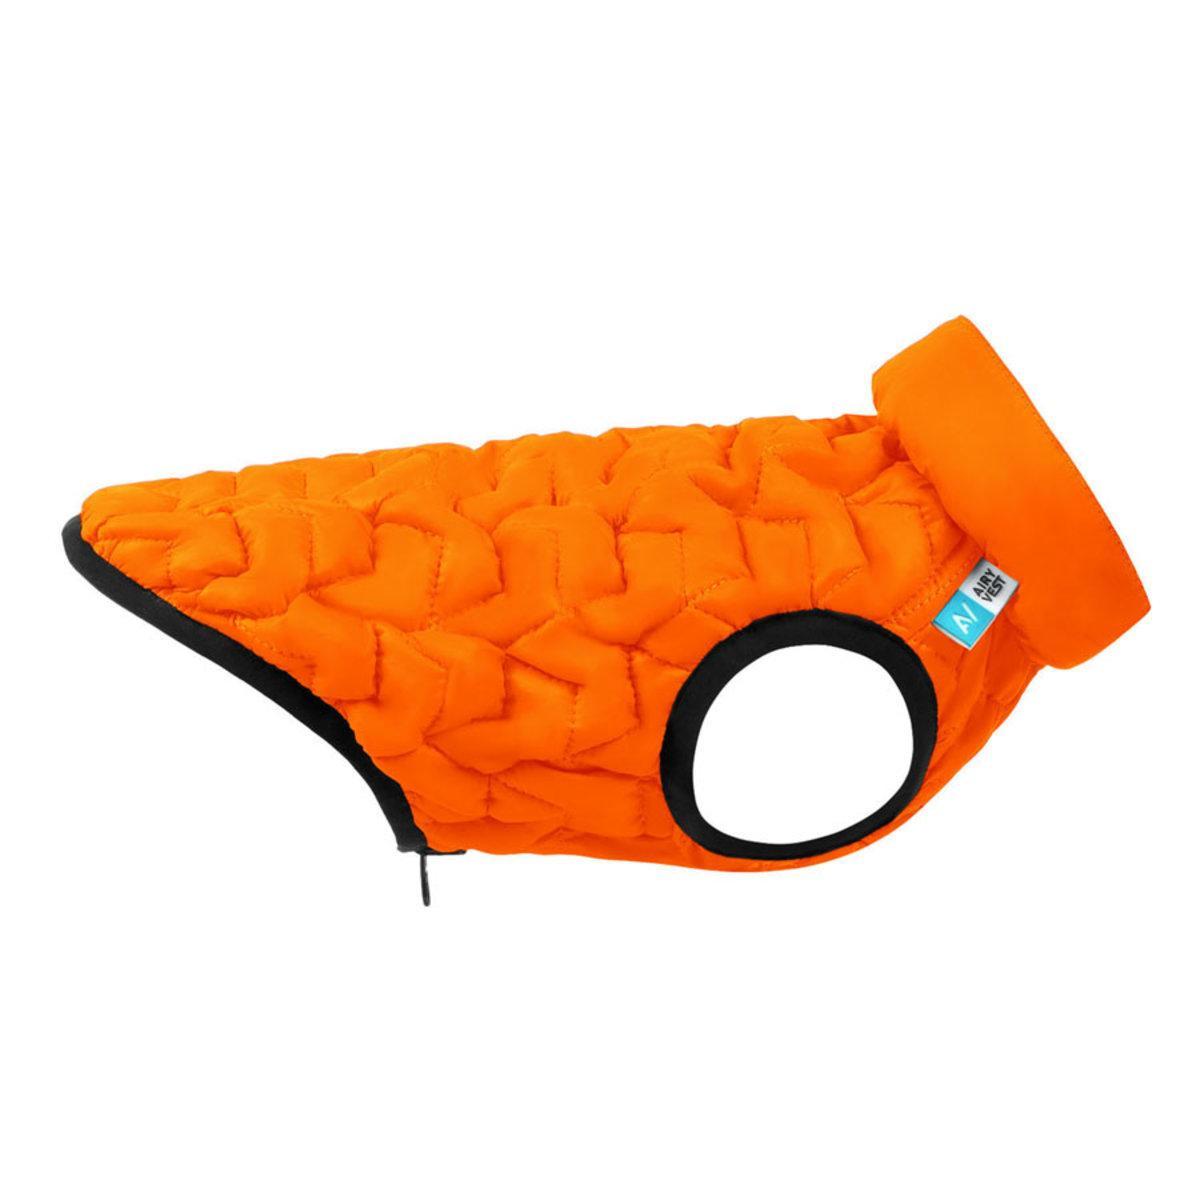 Курточка двусторонняя AiryVest UNI, размер XS 28, оранжево-черная